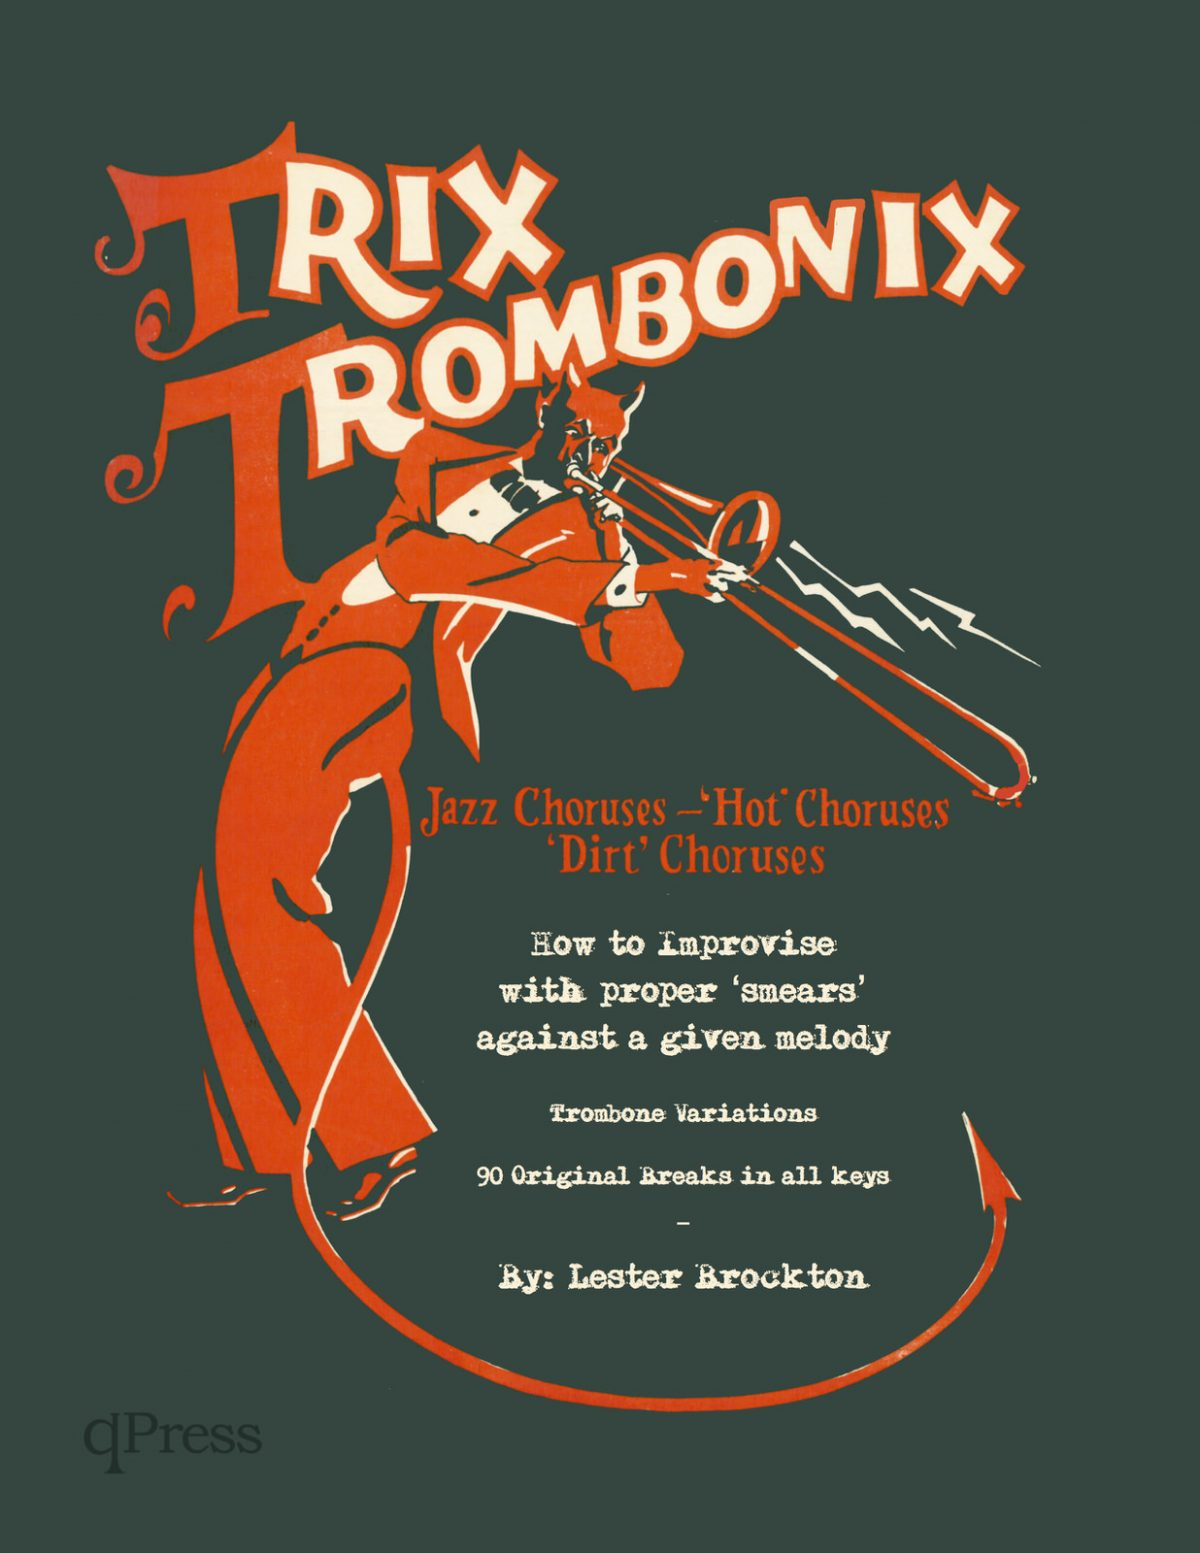 brockton-lester-trix-trombonix